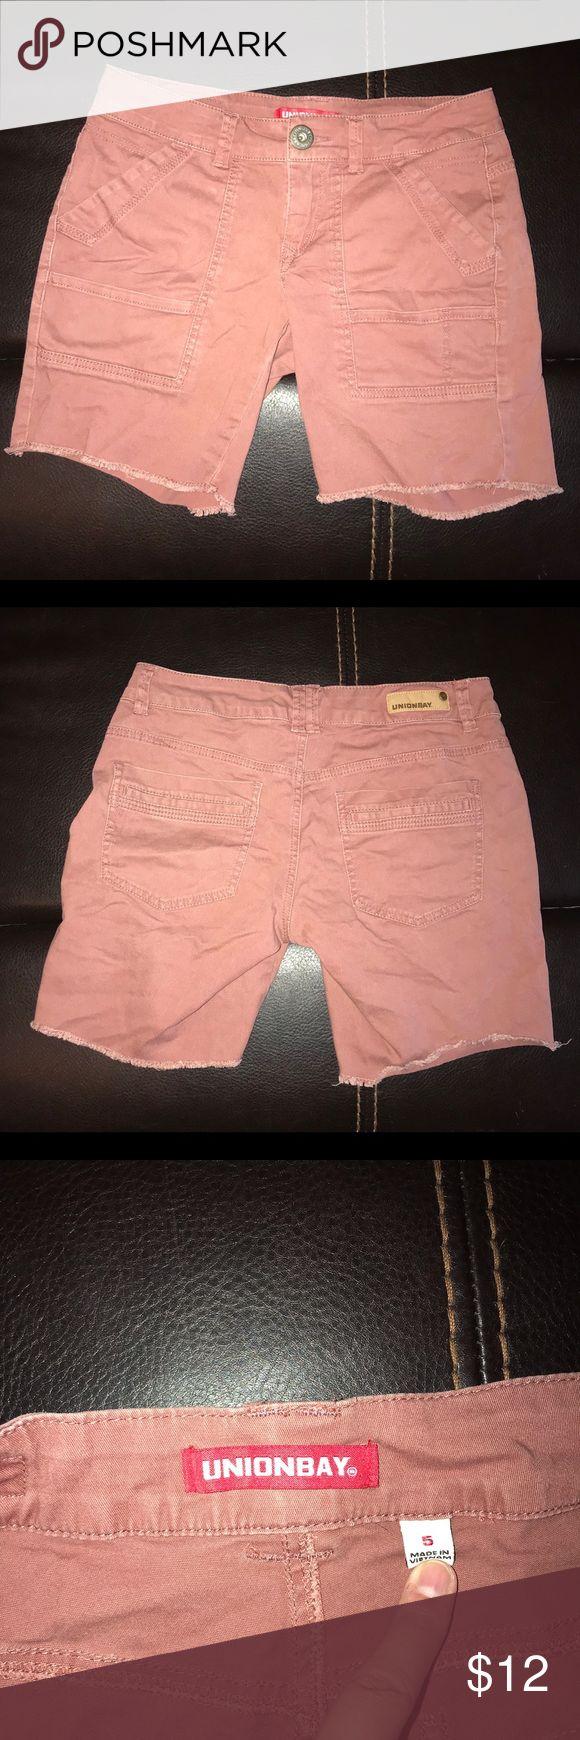 Unionbay Midi Juniors Shorts 5 Gently loved   junior's size